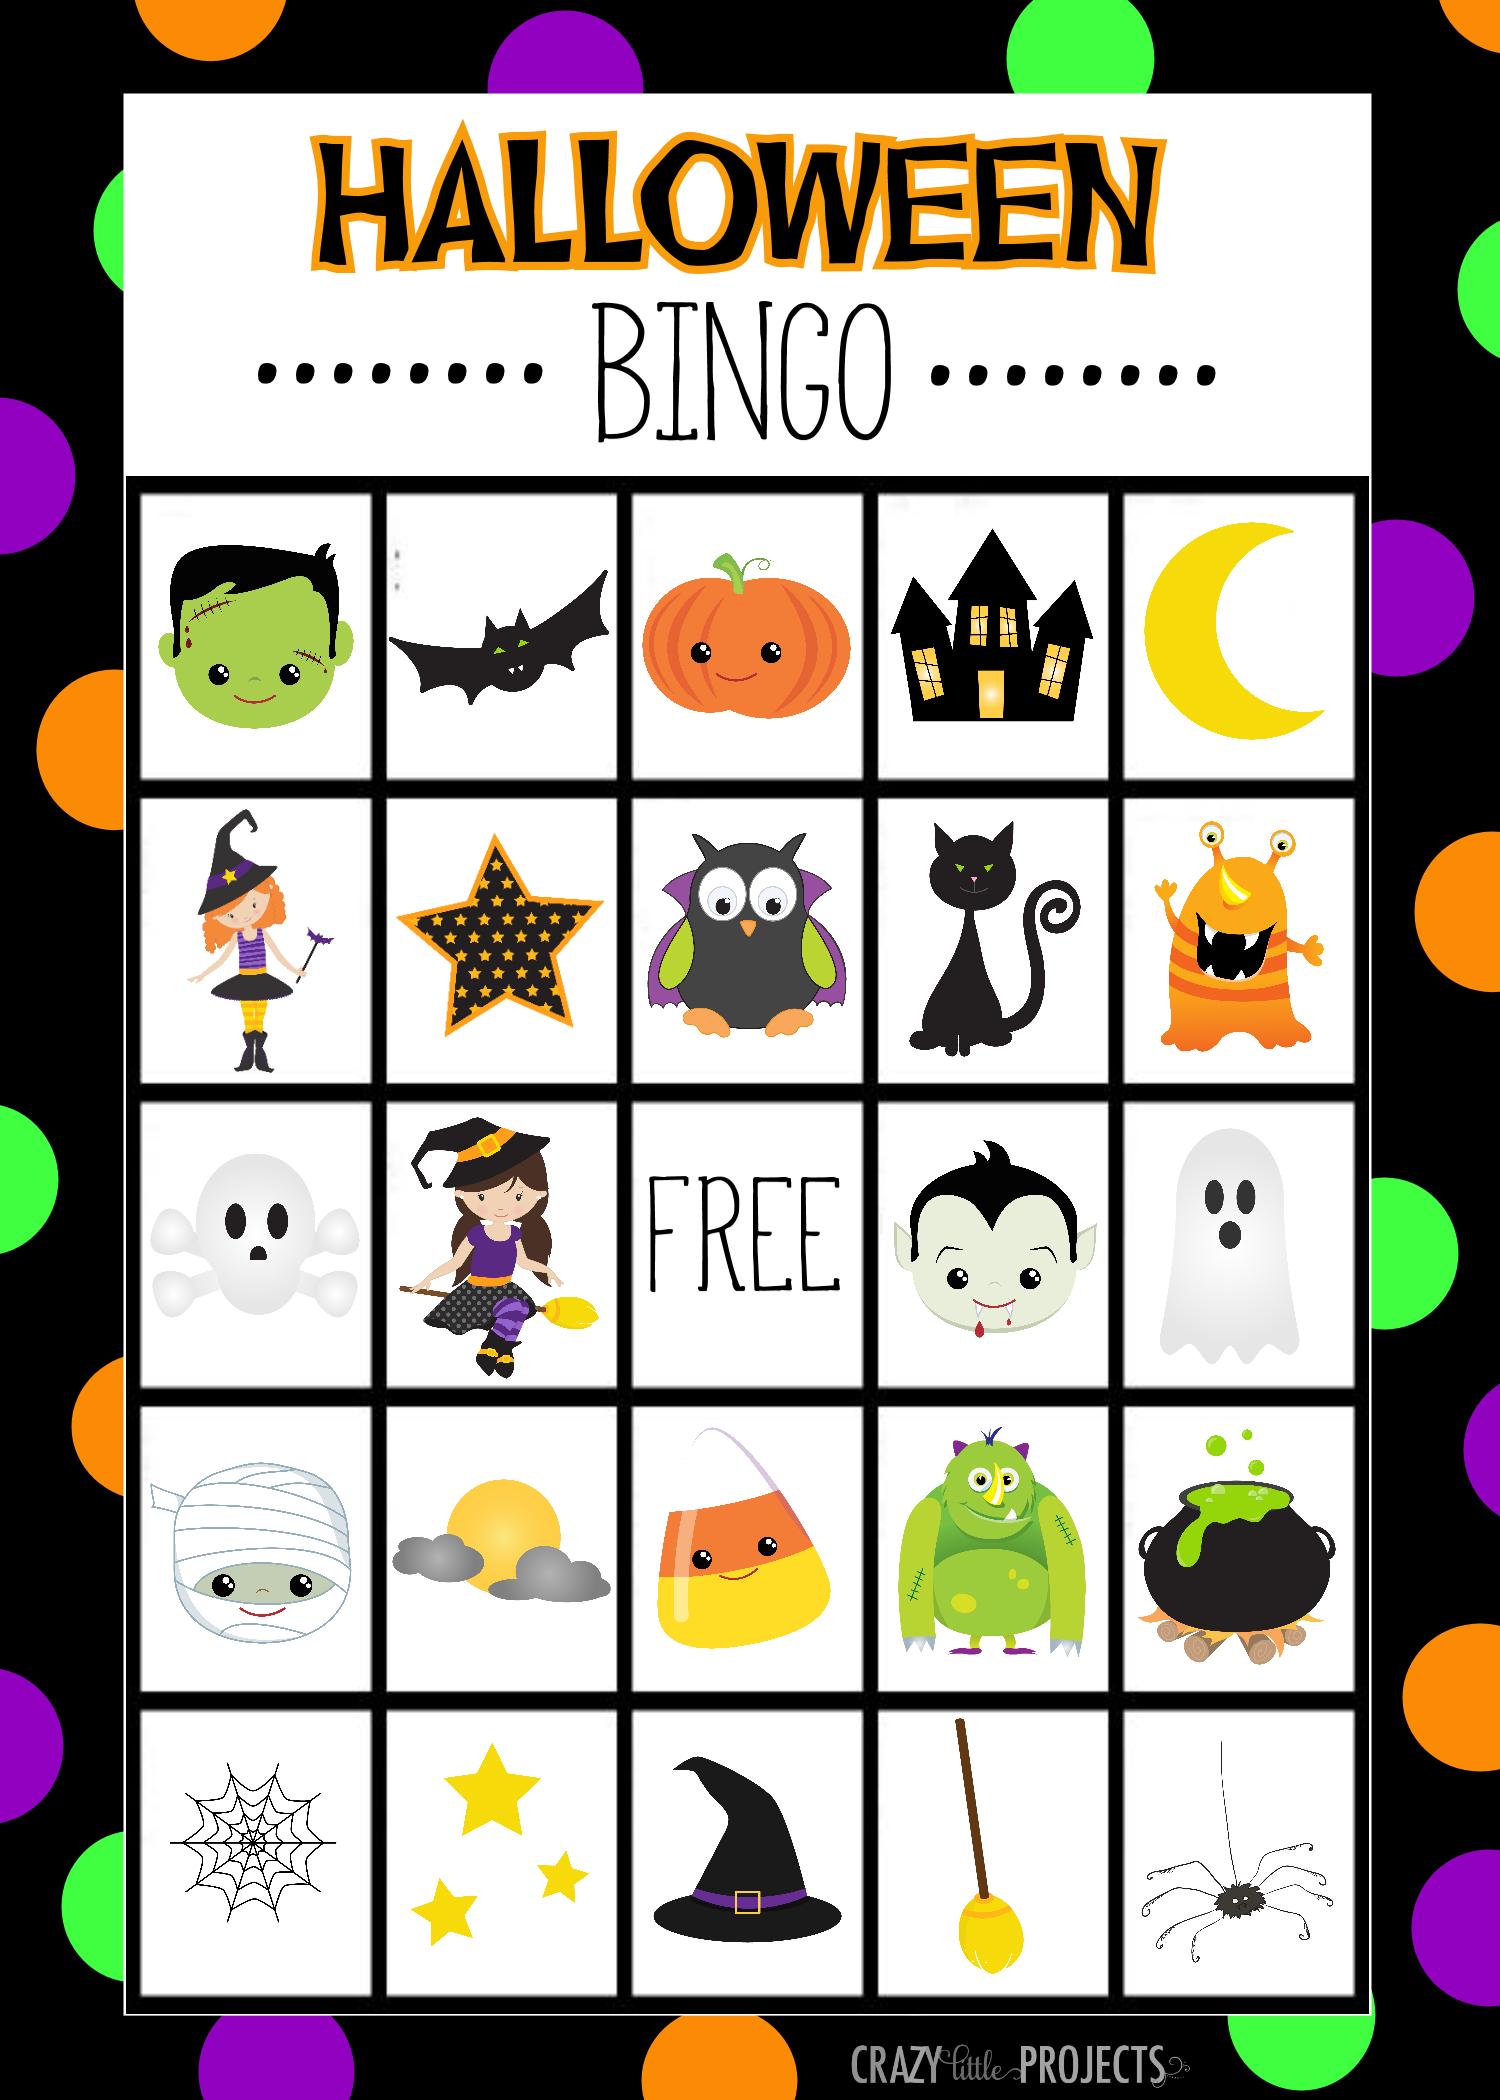 Free Printable Halloween Bingo Cardscrazy Little Projects - Free Printable Halloween Party Games